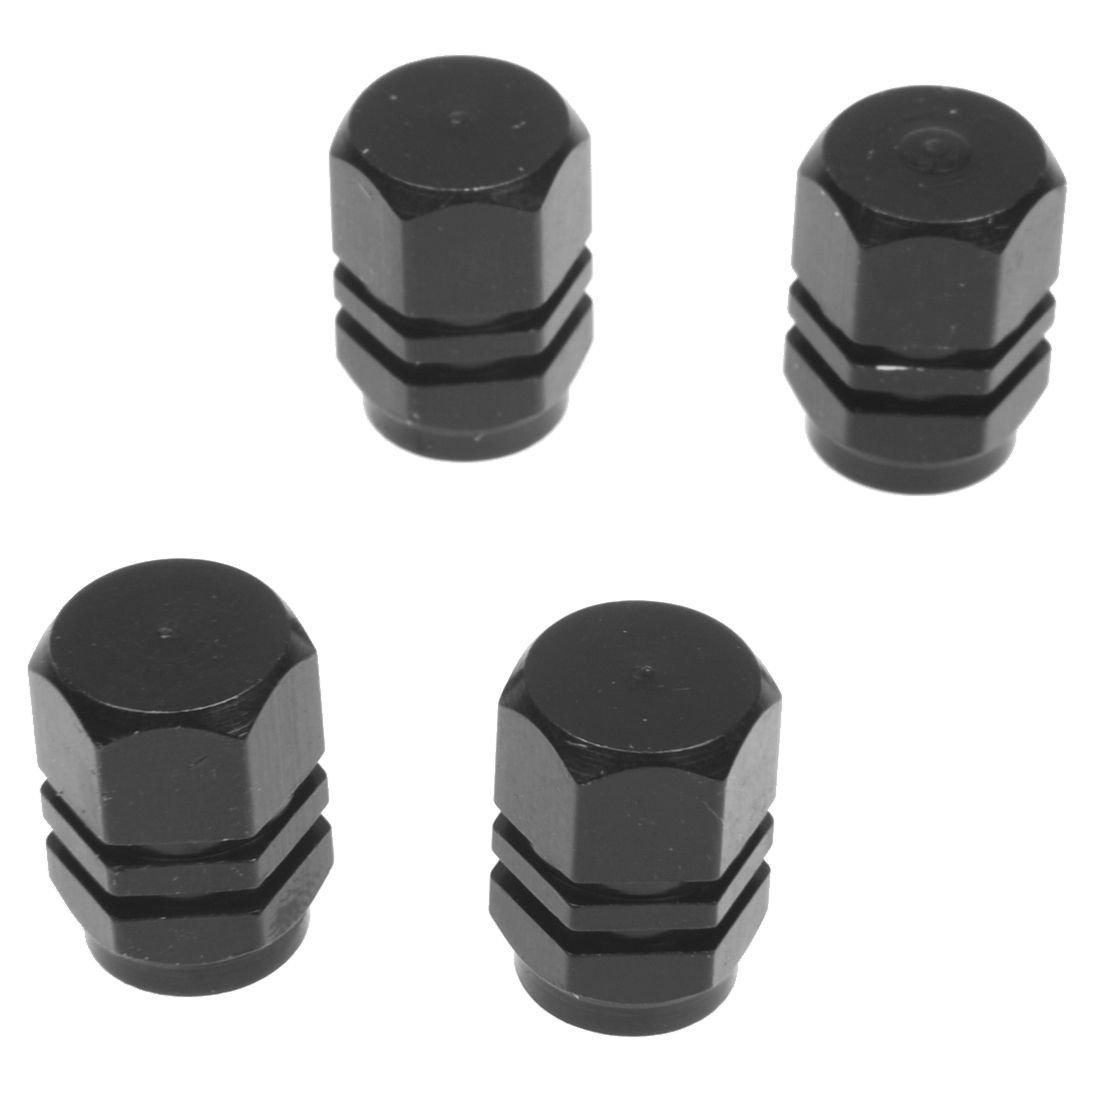 Valve cap - TOOGOO(R)Set of 4 Alu valve caps for tires of bicycle, motorcycle, car - Black